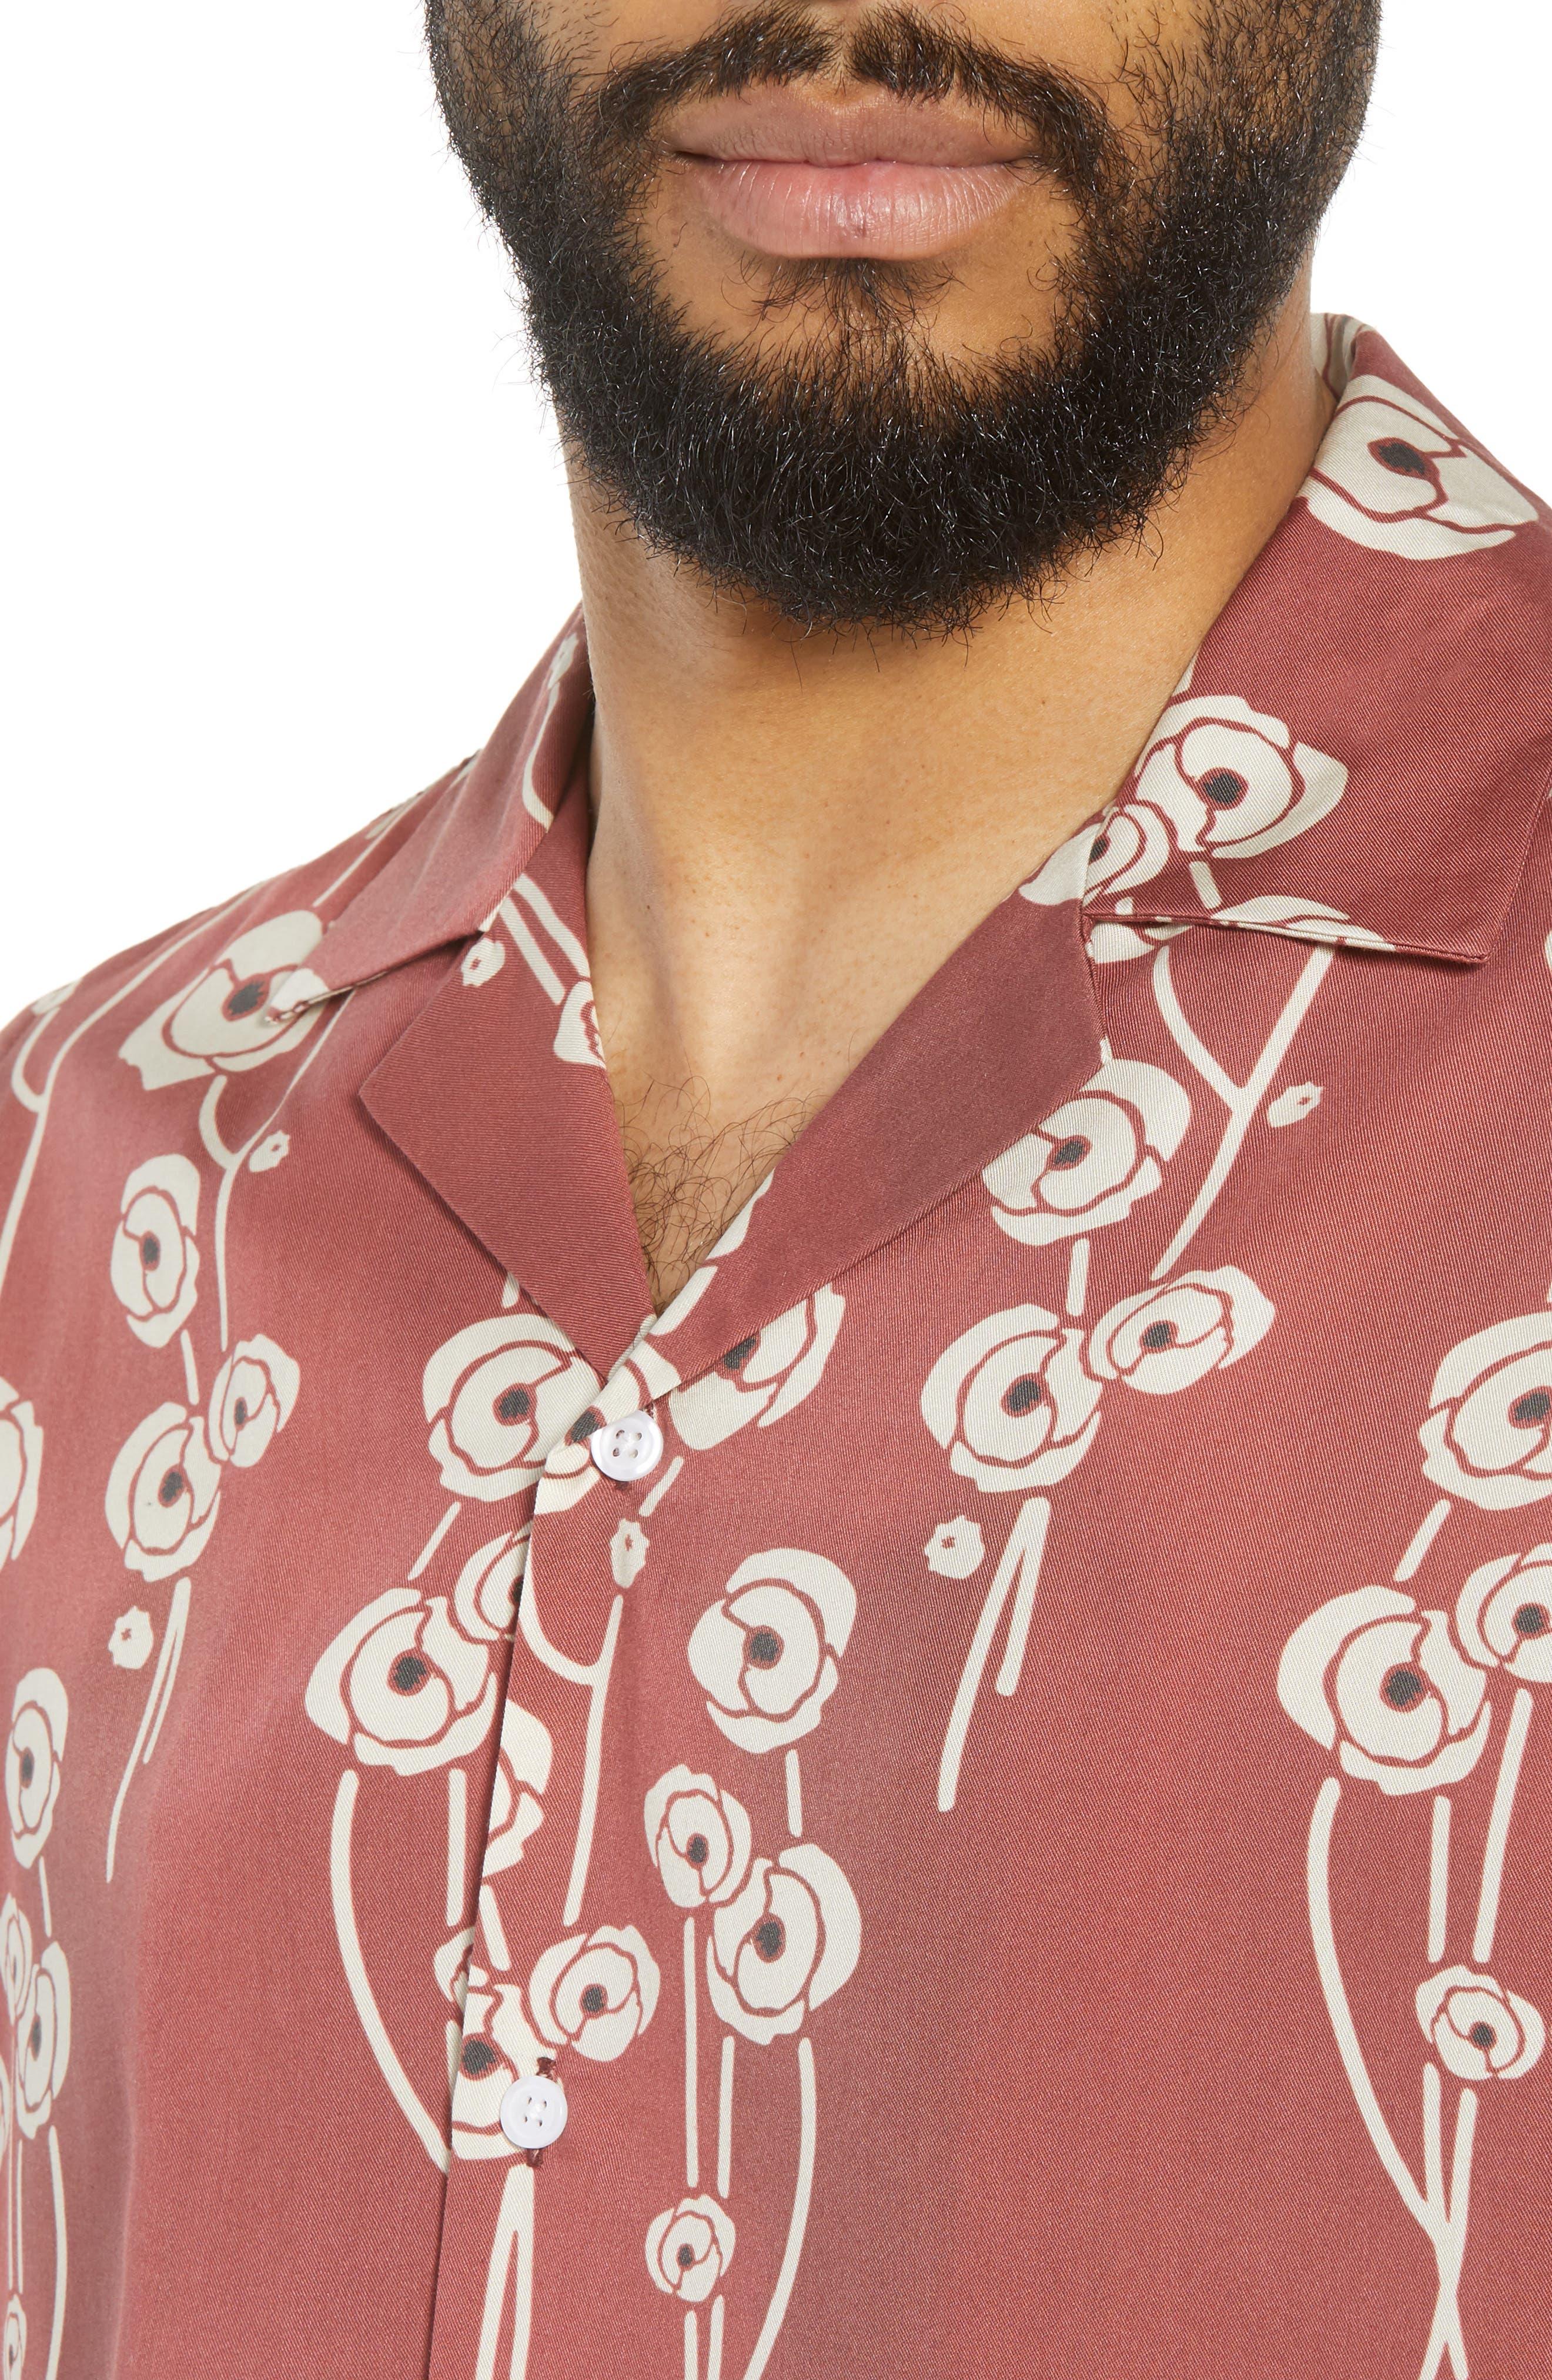 Canty Poppy Woven Shirt,                             Alternate thumbnail 2, color,                             Brick